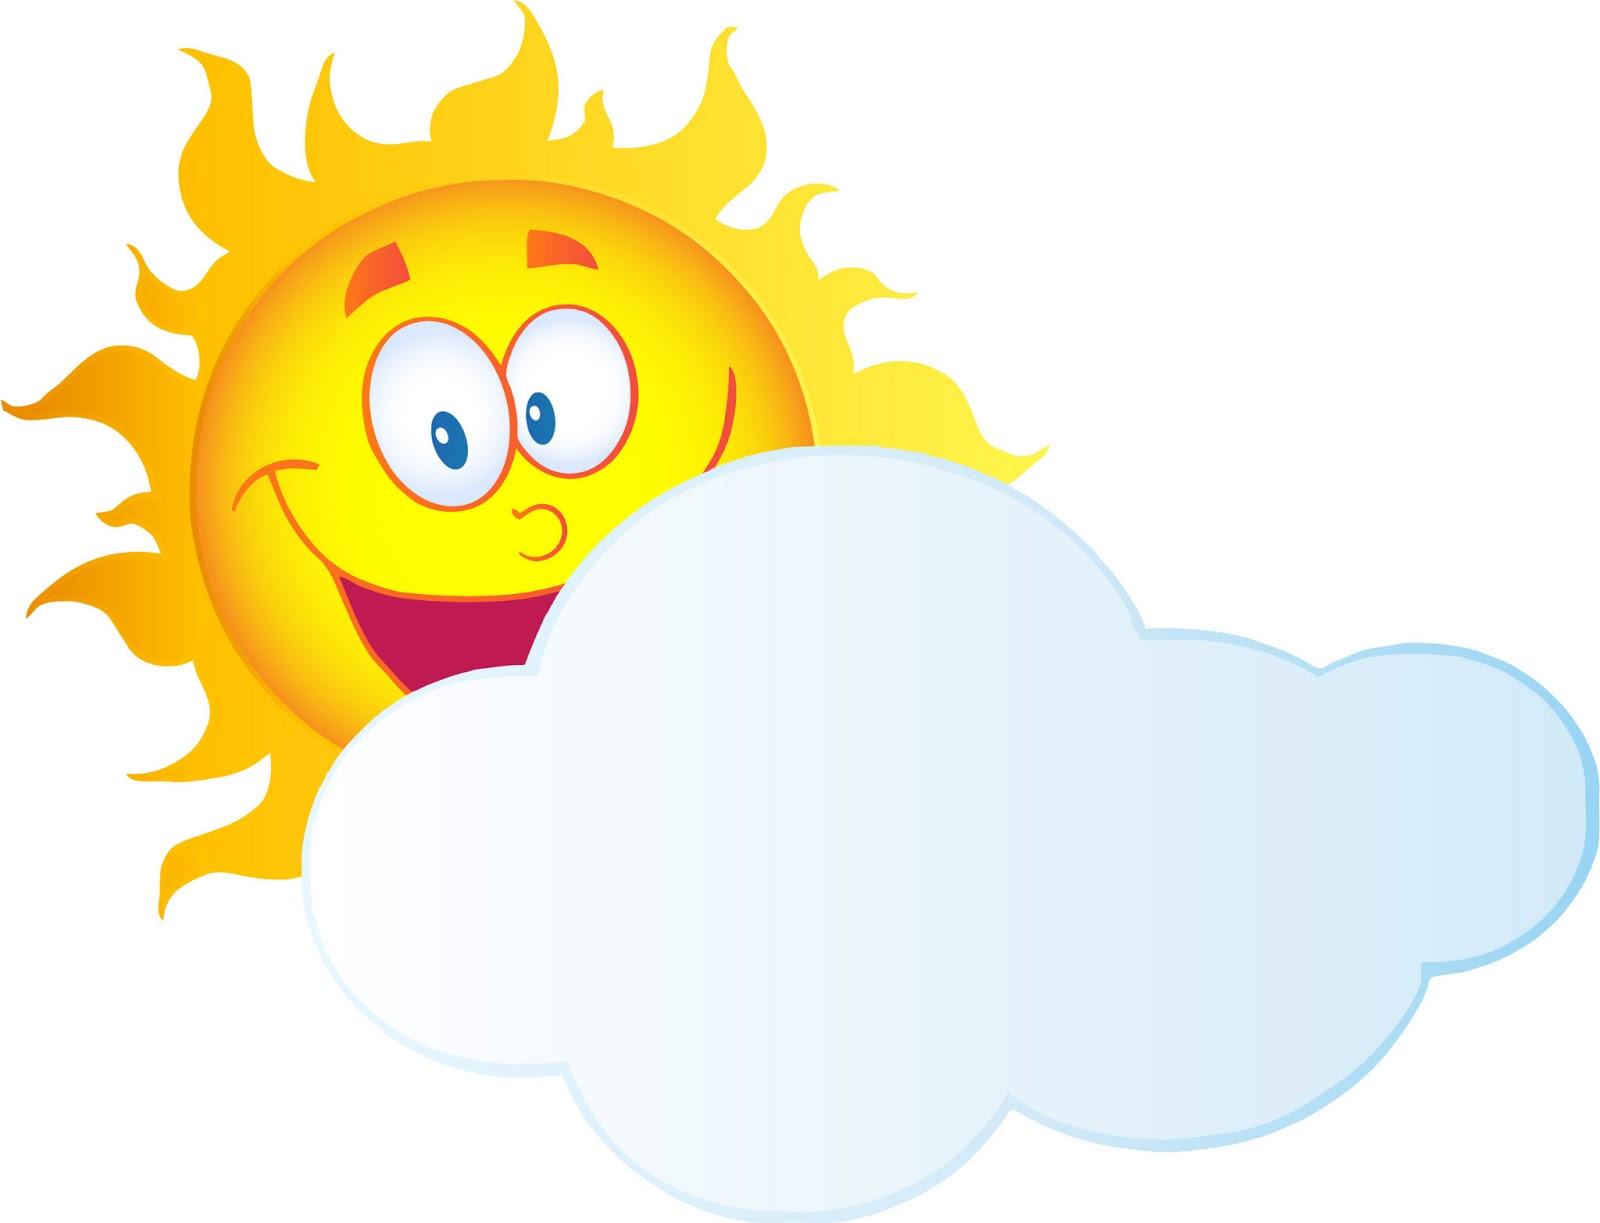 Sun And Cloud Clipart - Clipart Kid